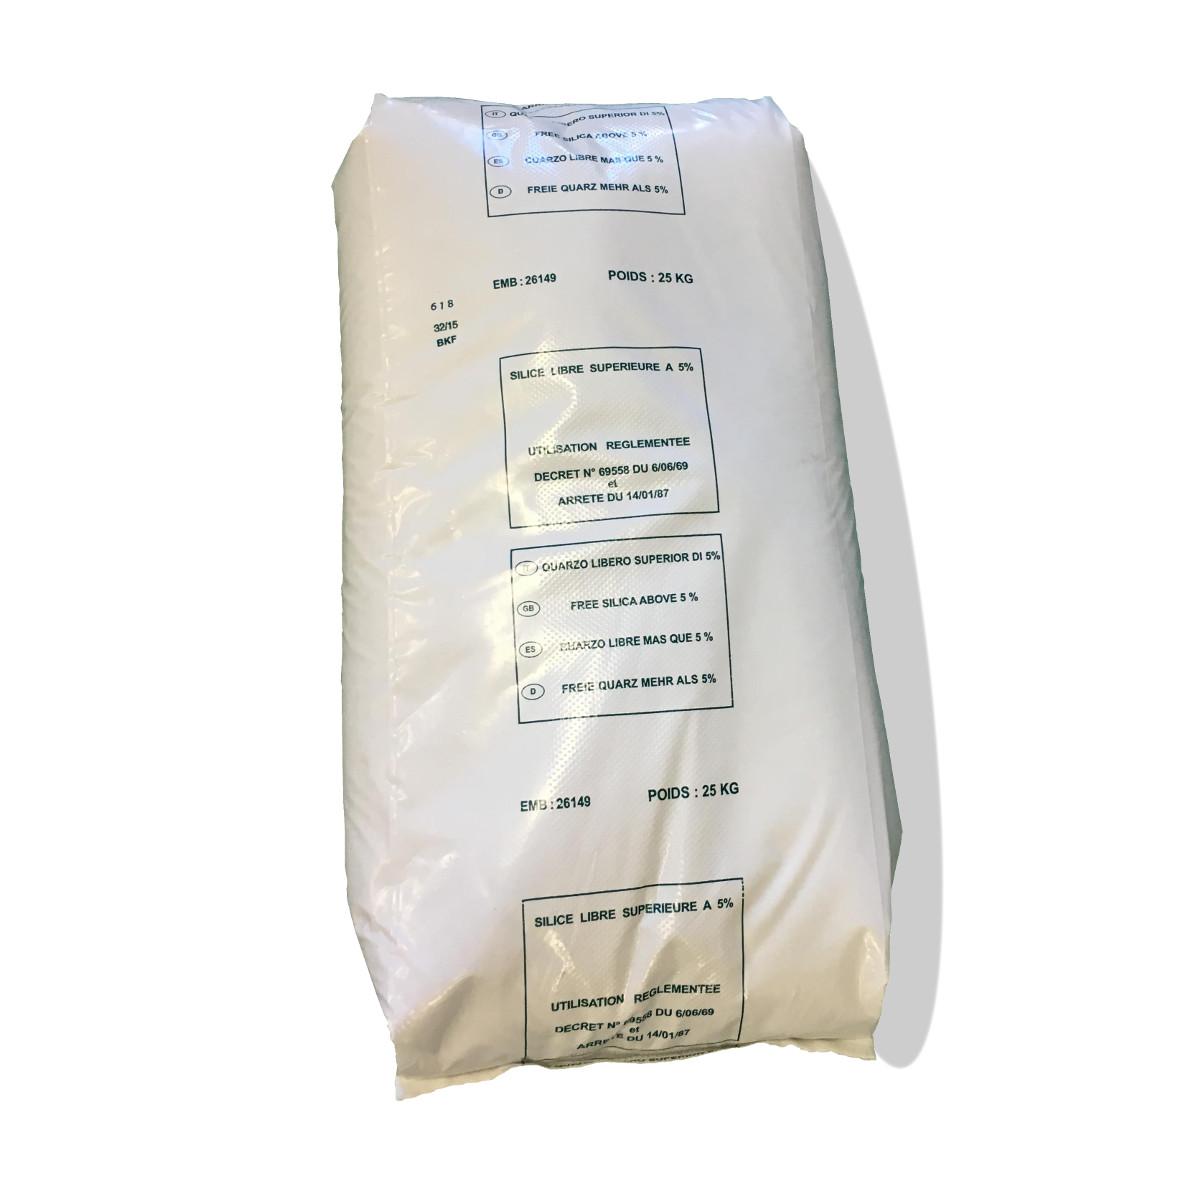 Sac de sable 0,16 - 1,6 mm 25 kg | AELLO